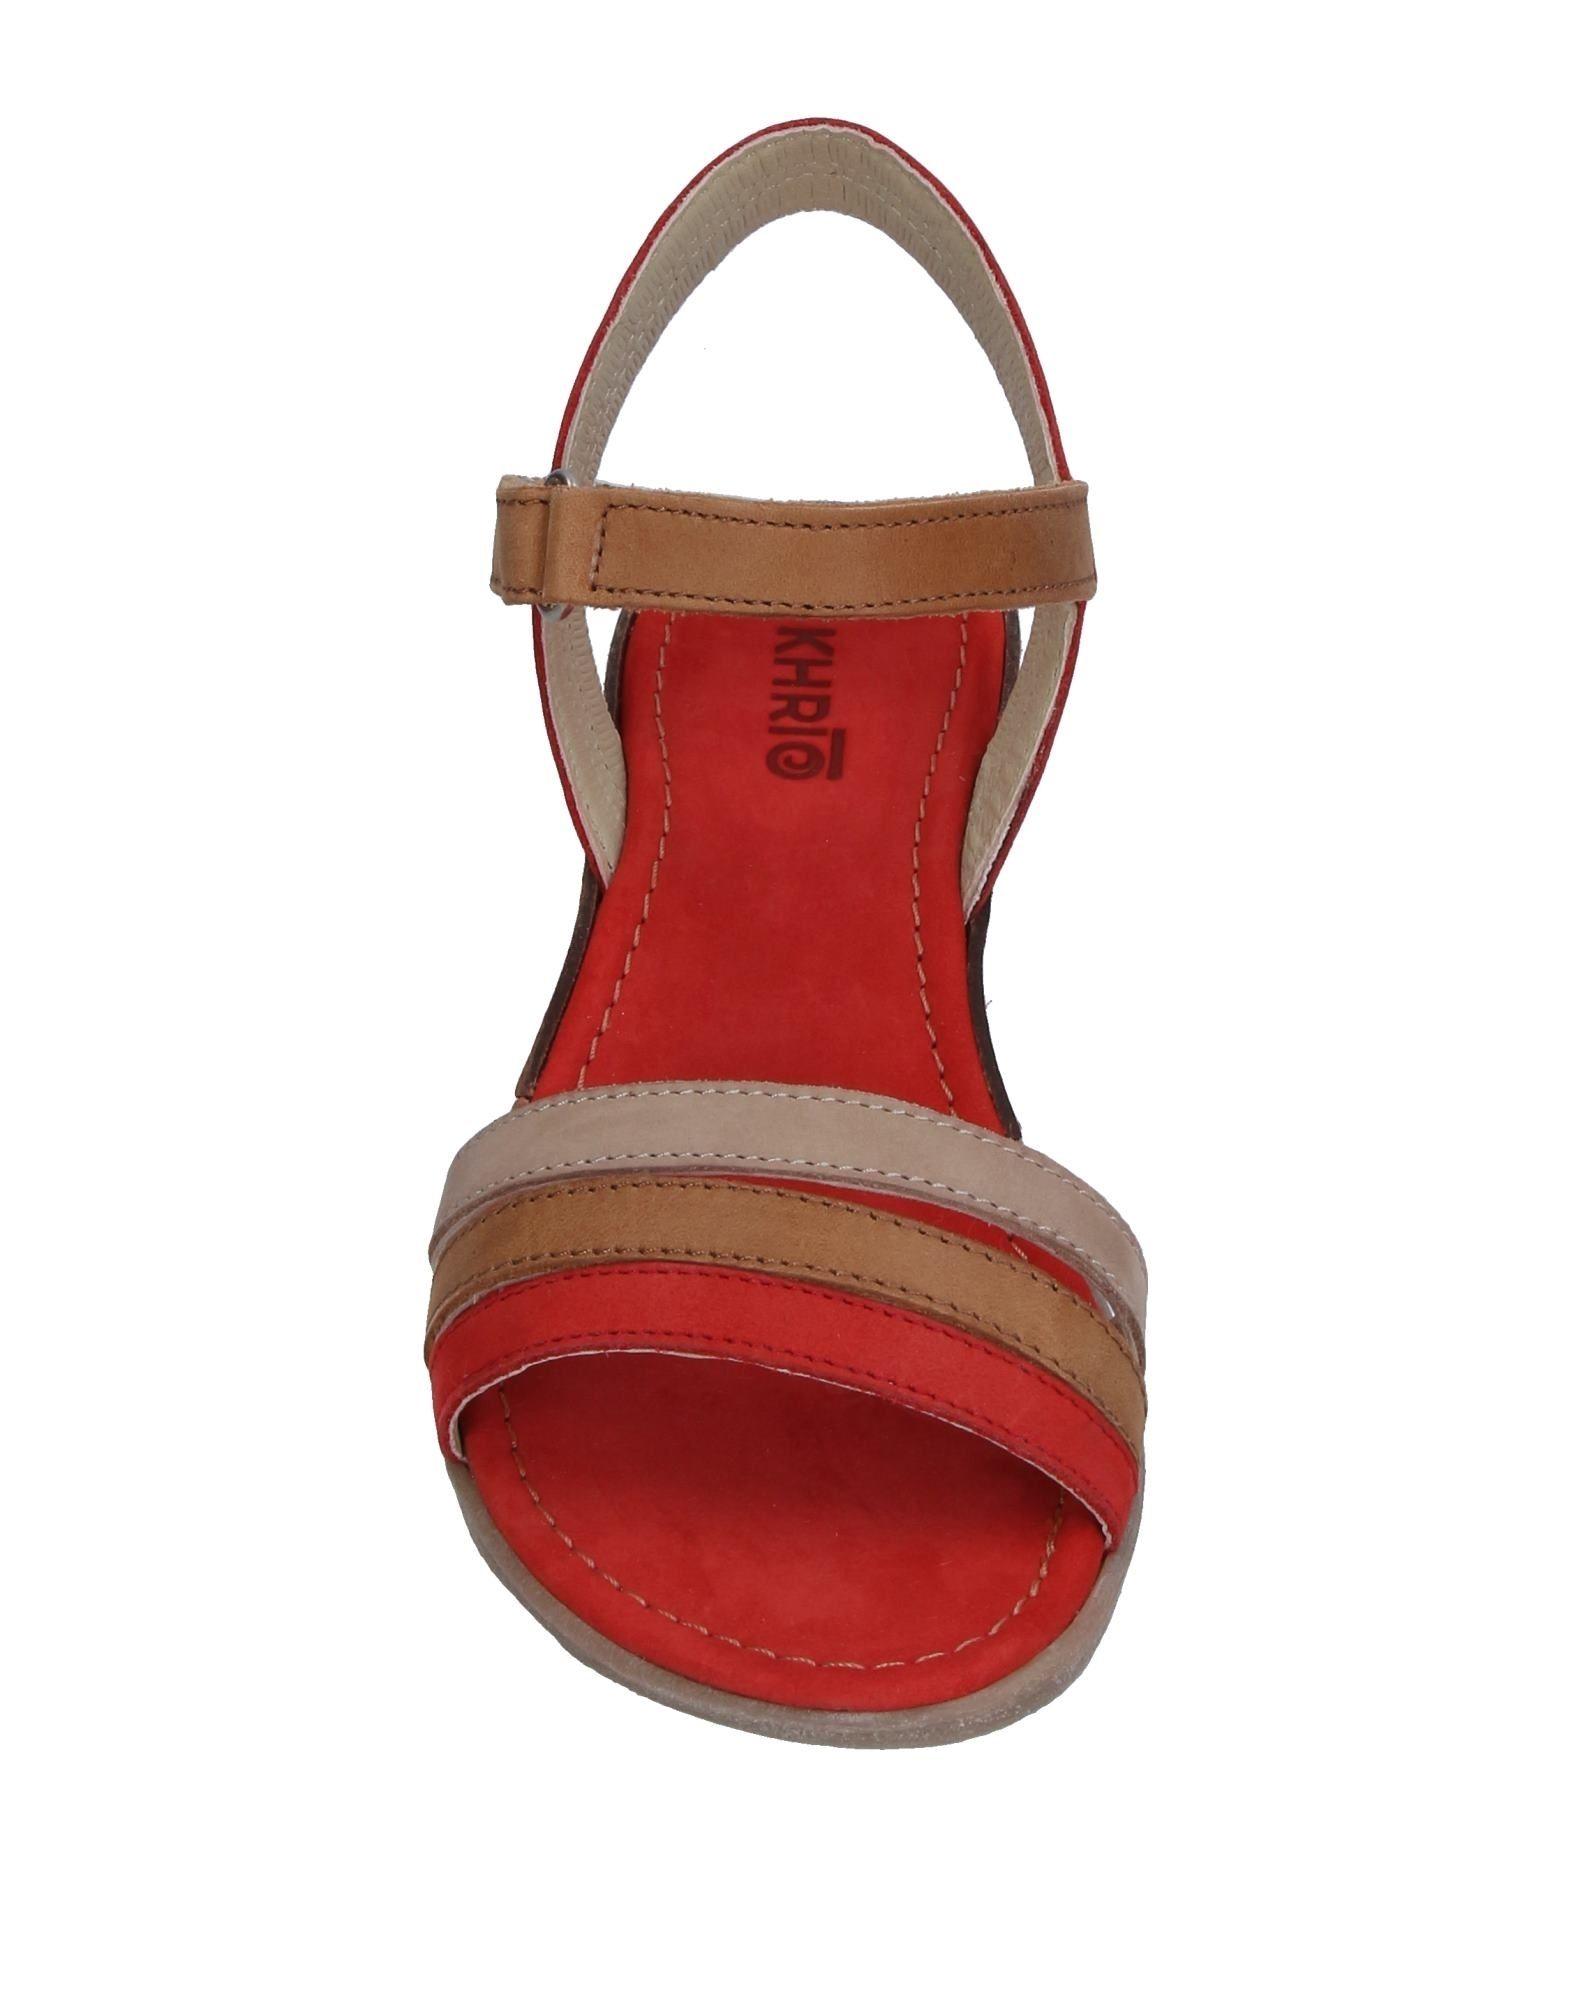 Khrio' Sandalen Sandalen Khrio' Damen  11326988DV Heiße Schuhe a81e89